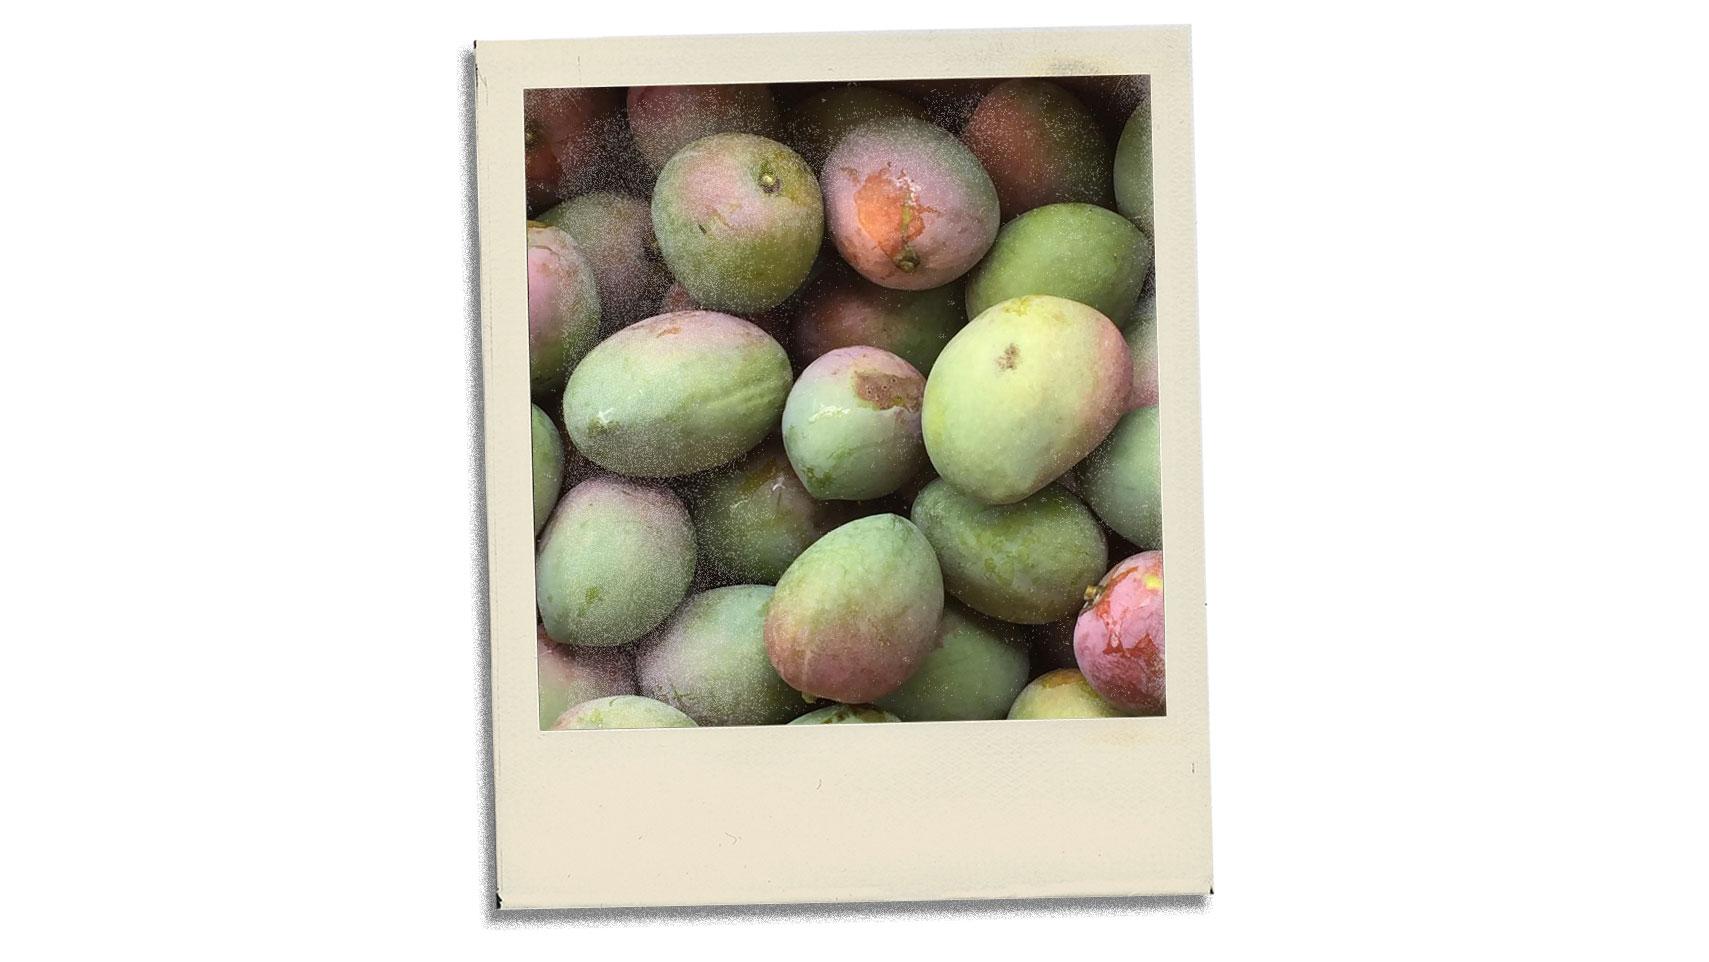 Article-Postcard-From-Deli-Mango-Season